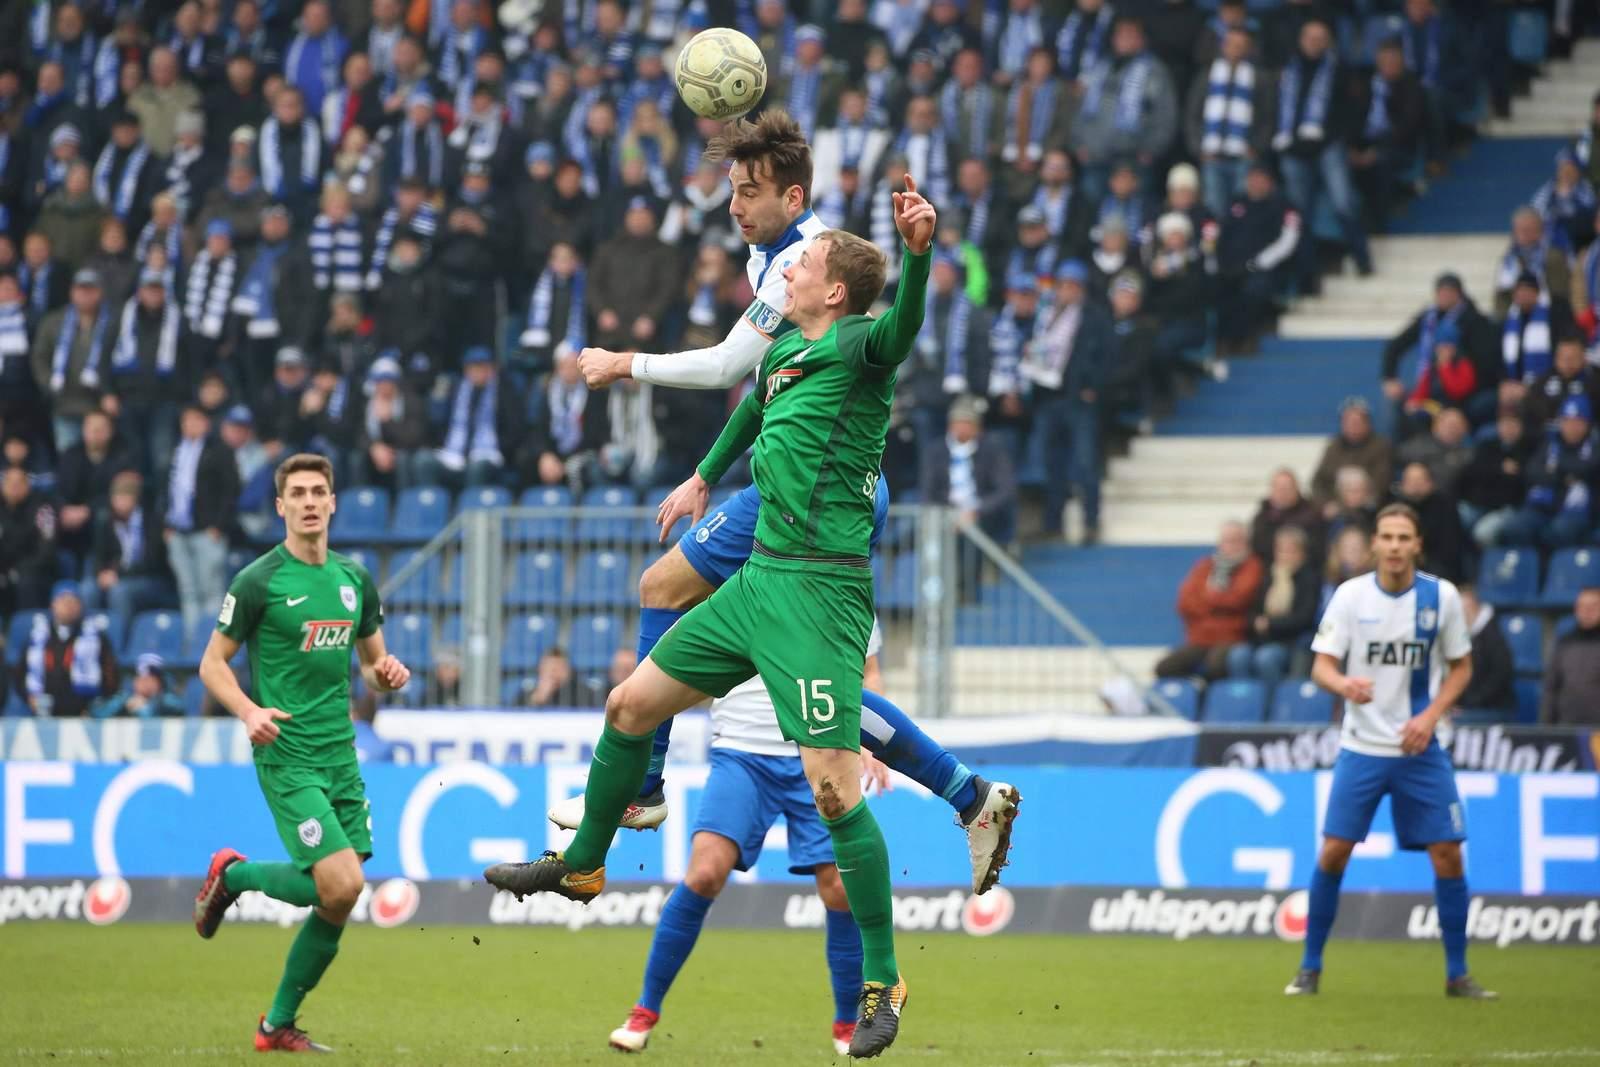 Magdeburgs Christian Beck springt höher als Münsters Simon Scherder